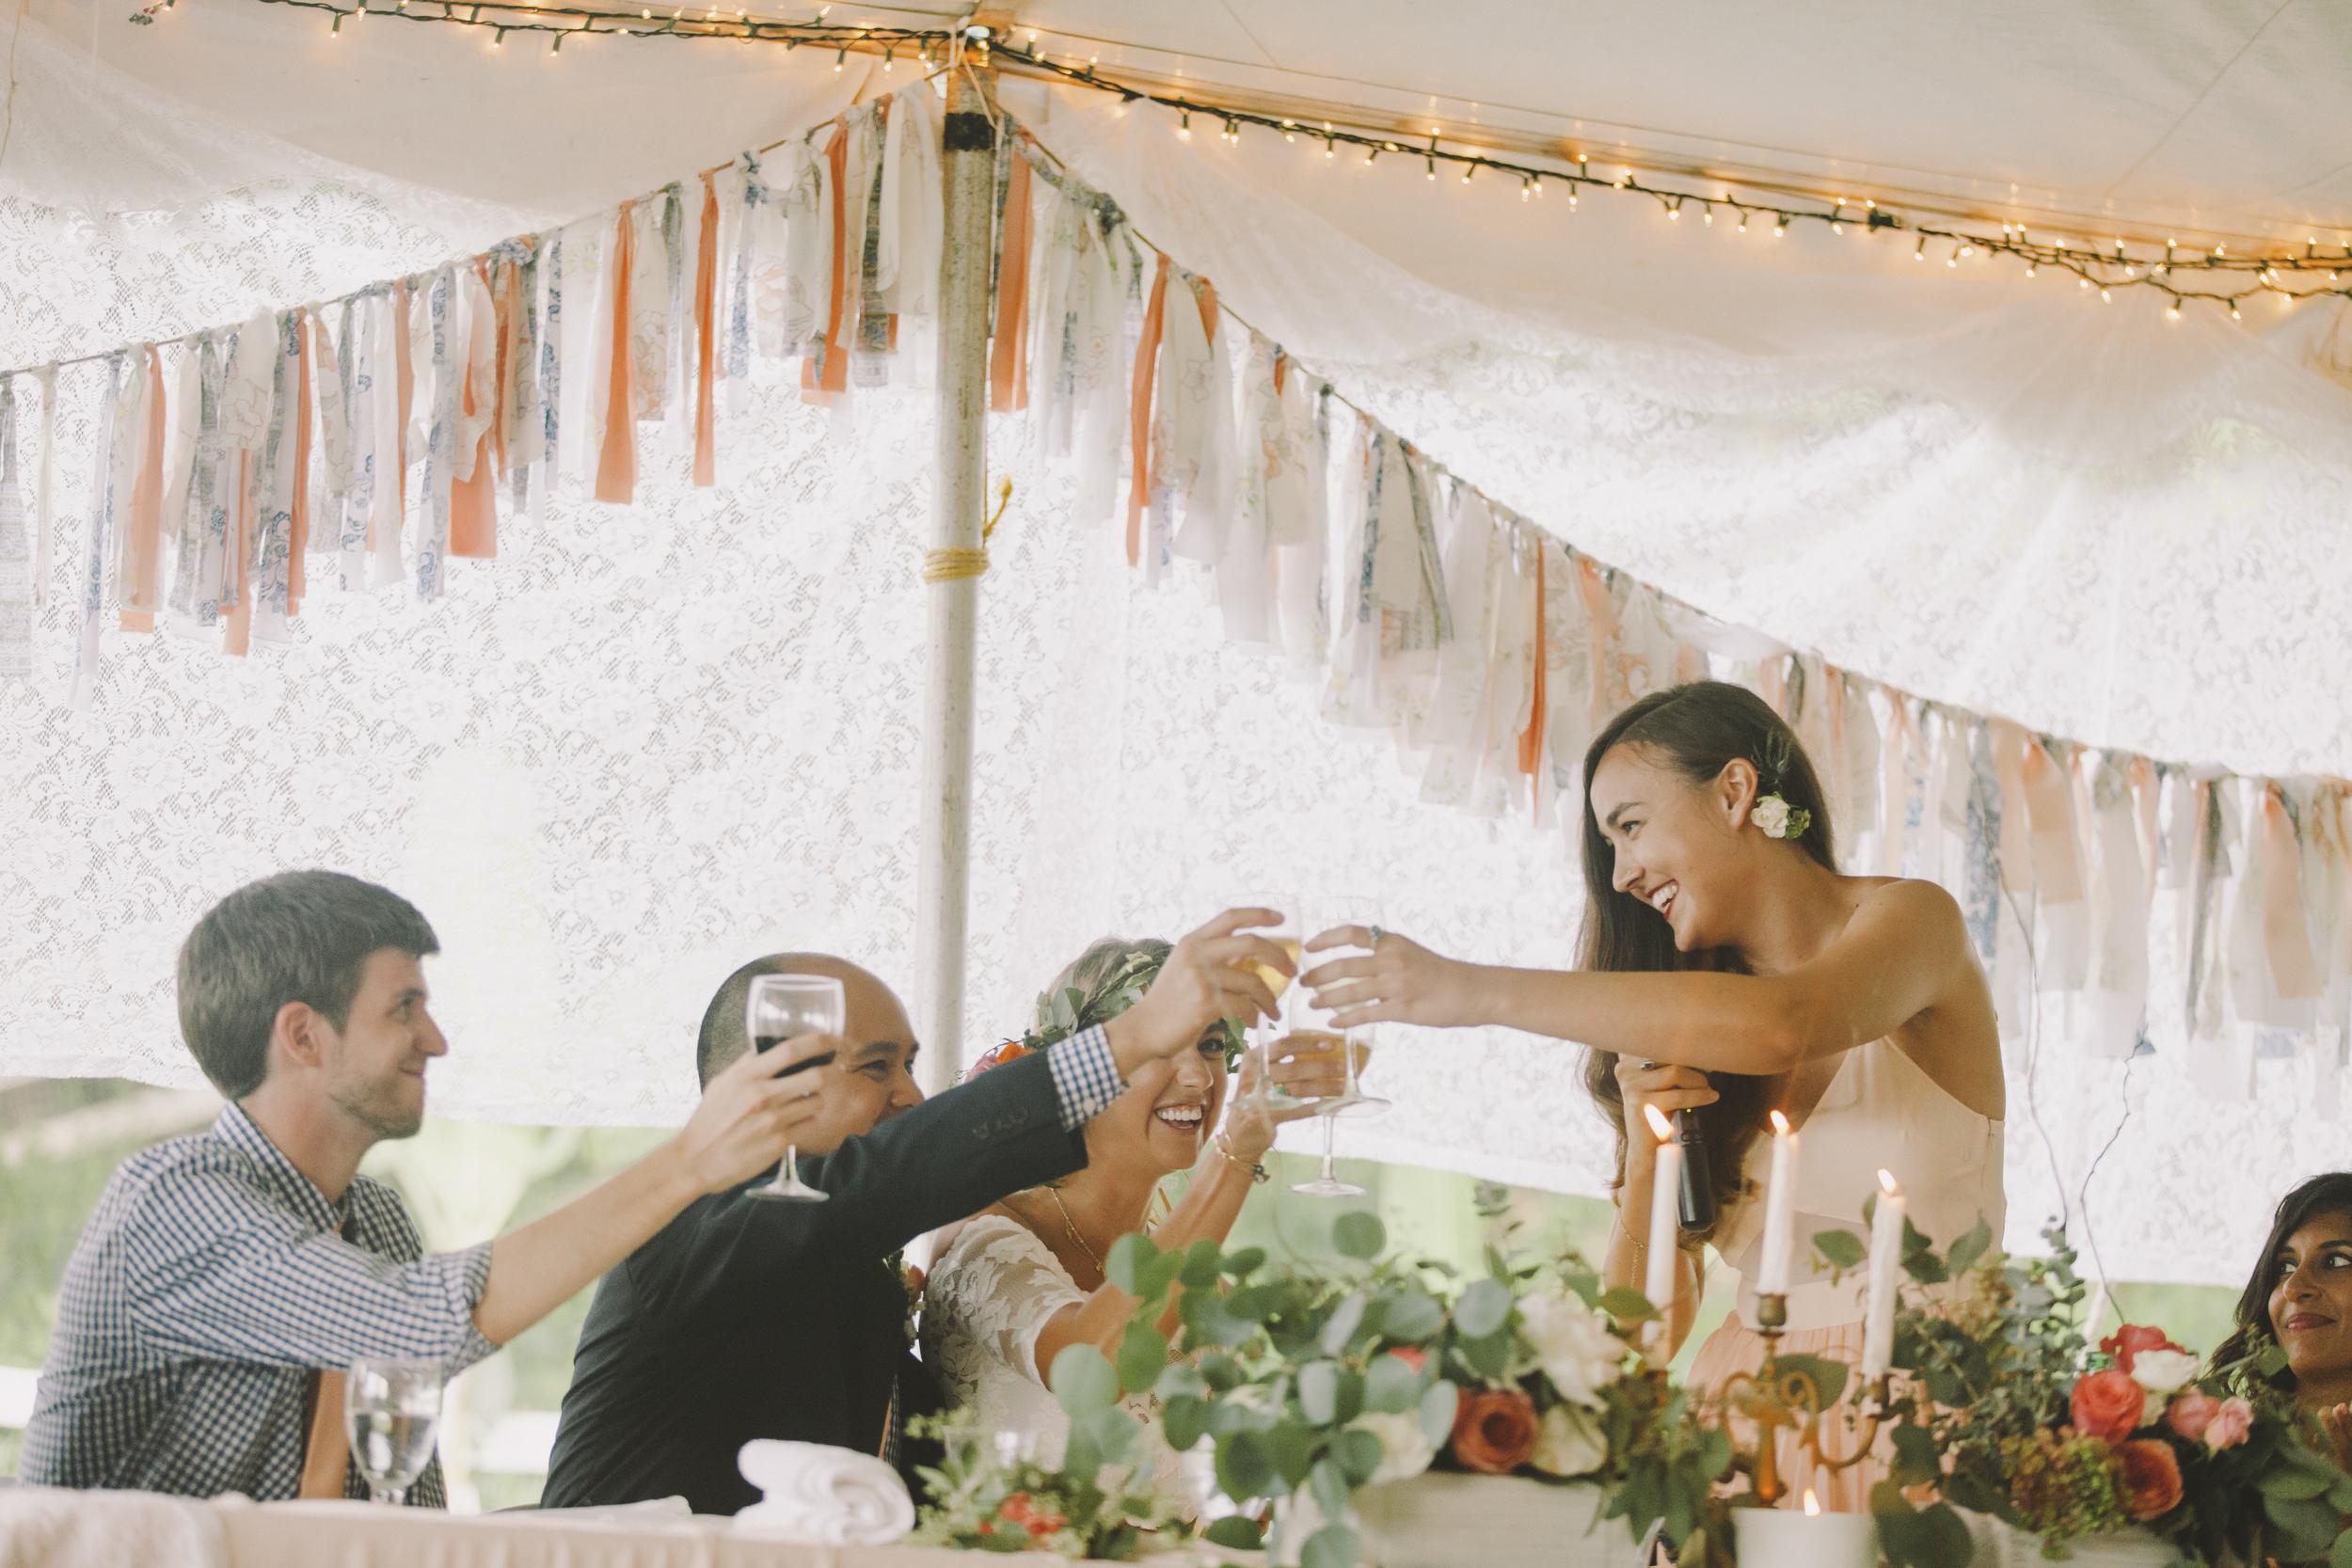 angie-diaz-photography-oahu-hawaii-wedding-tradewinds-ranch-113.jpg